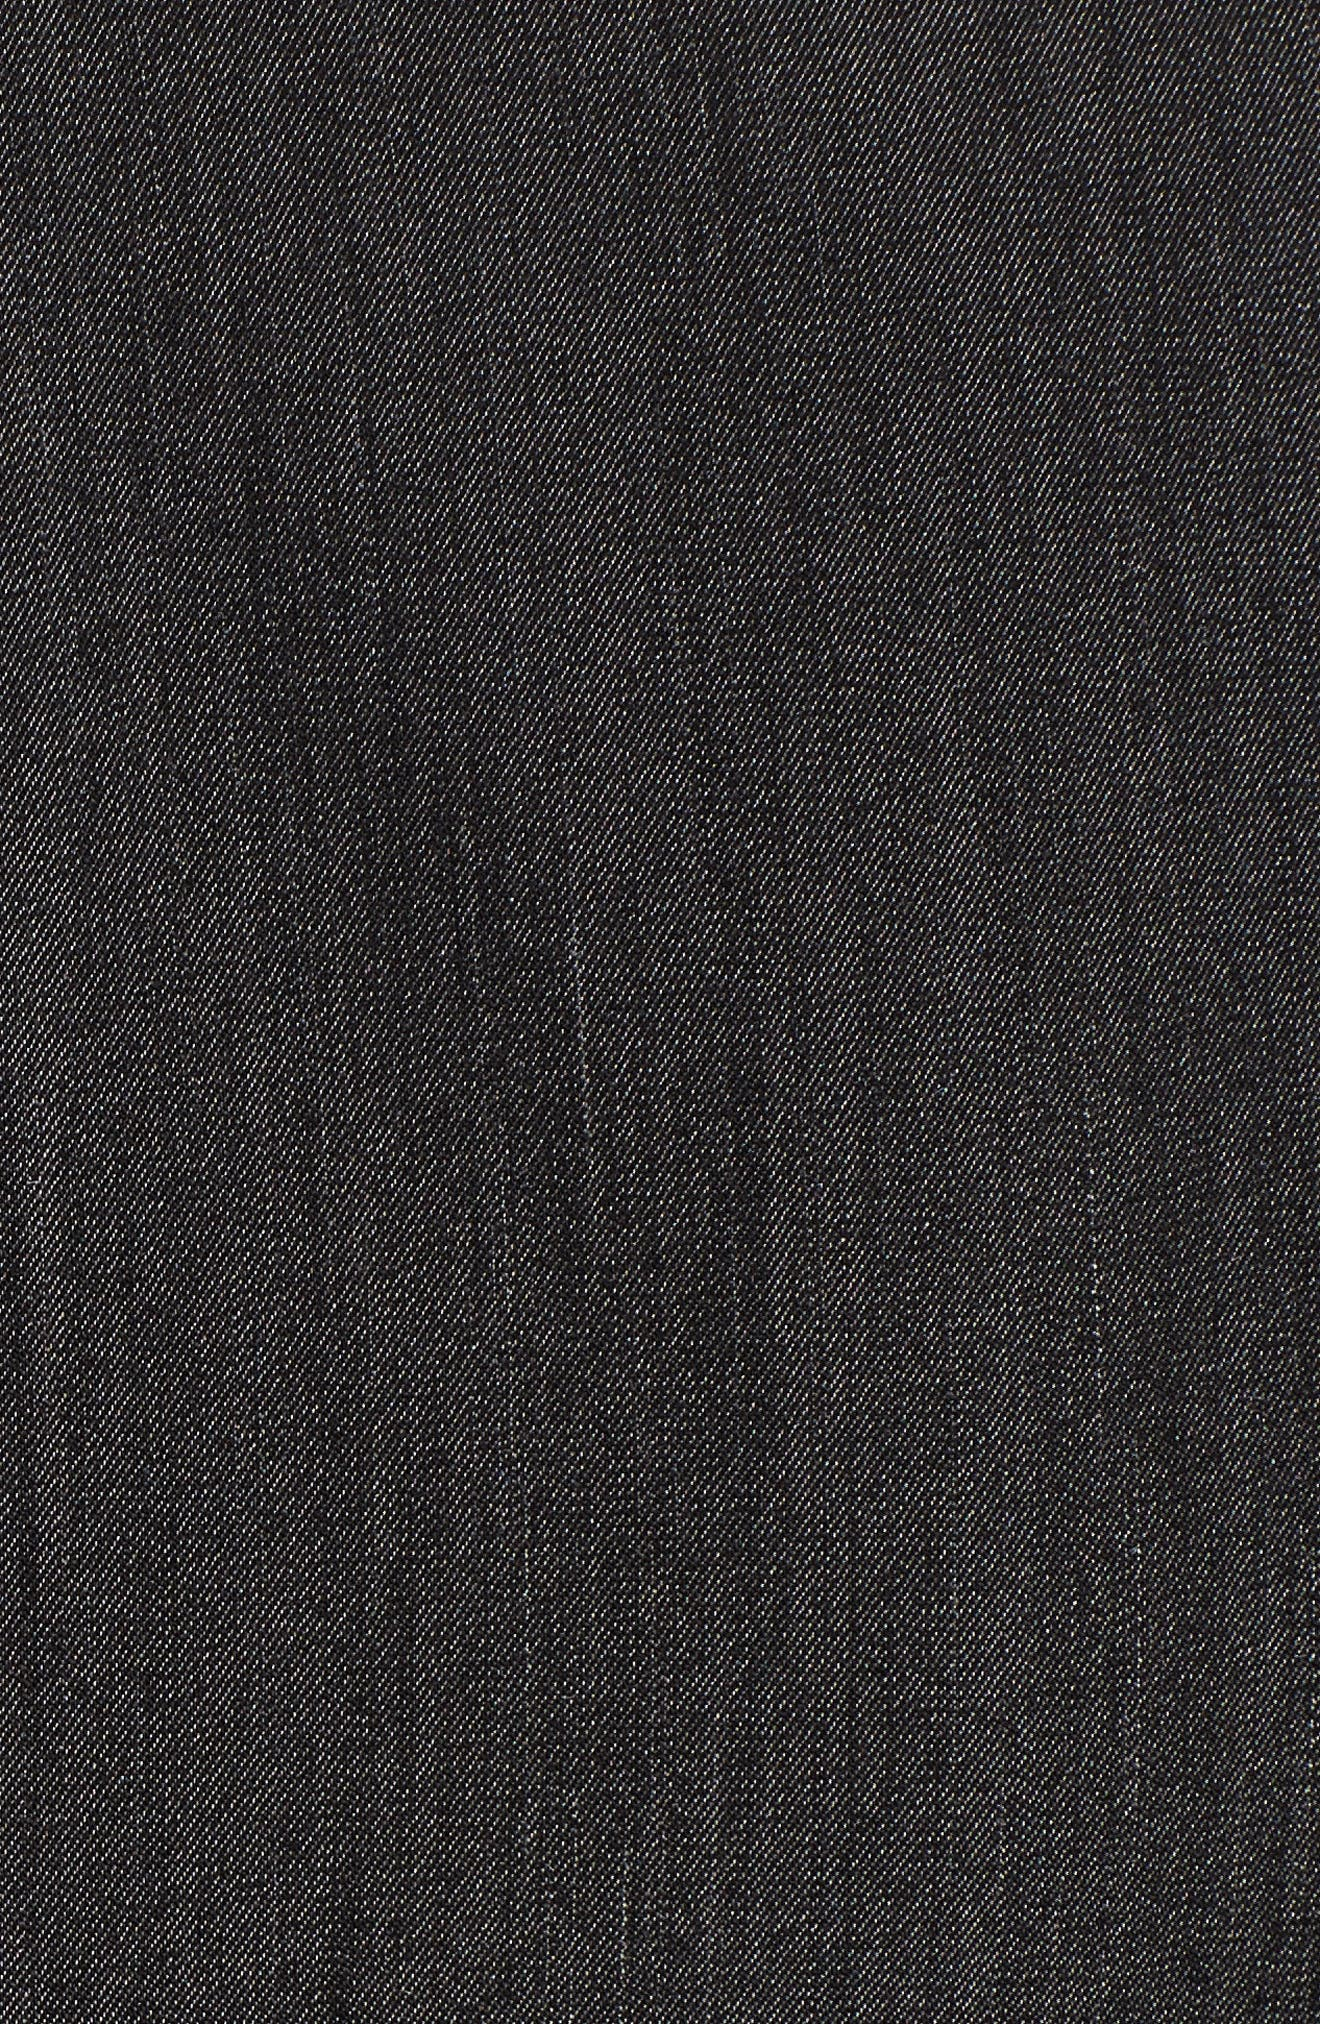 Notch Collar Stretch Denim Dress,                             Alternate thumbnail 5, color,                             Black